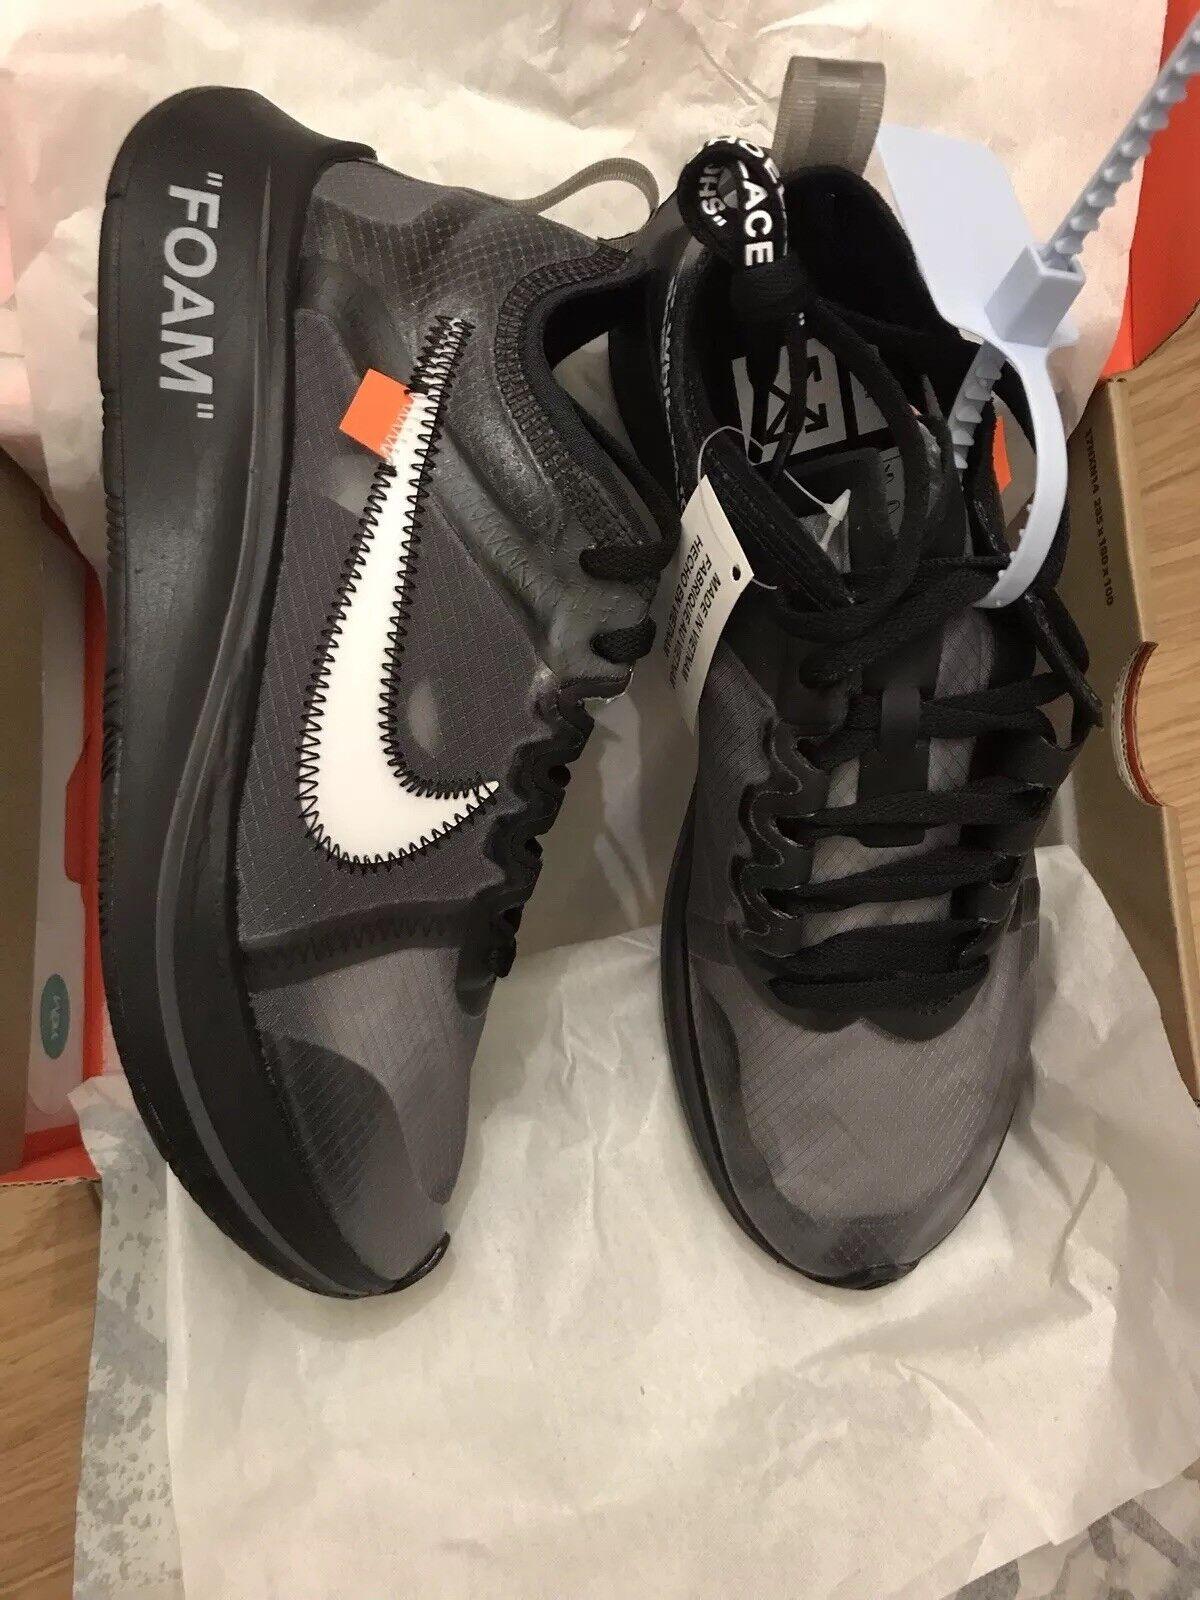 Nike X Off White Zoom Fly 'The Ten' Black   Grey UK 5.5 - US 6